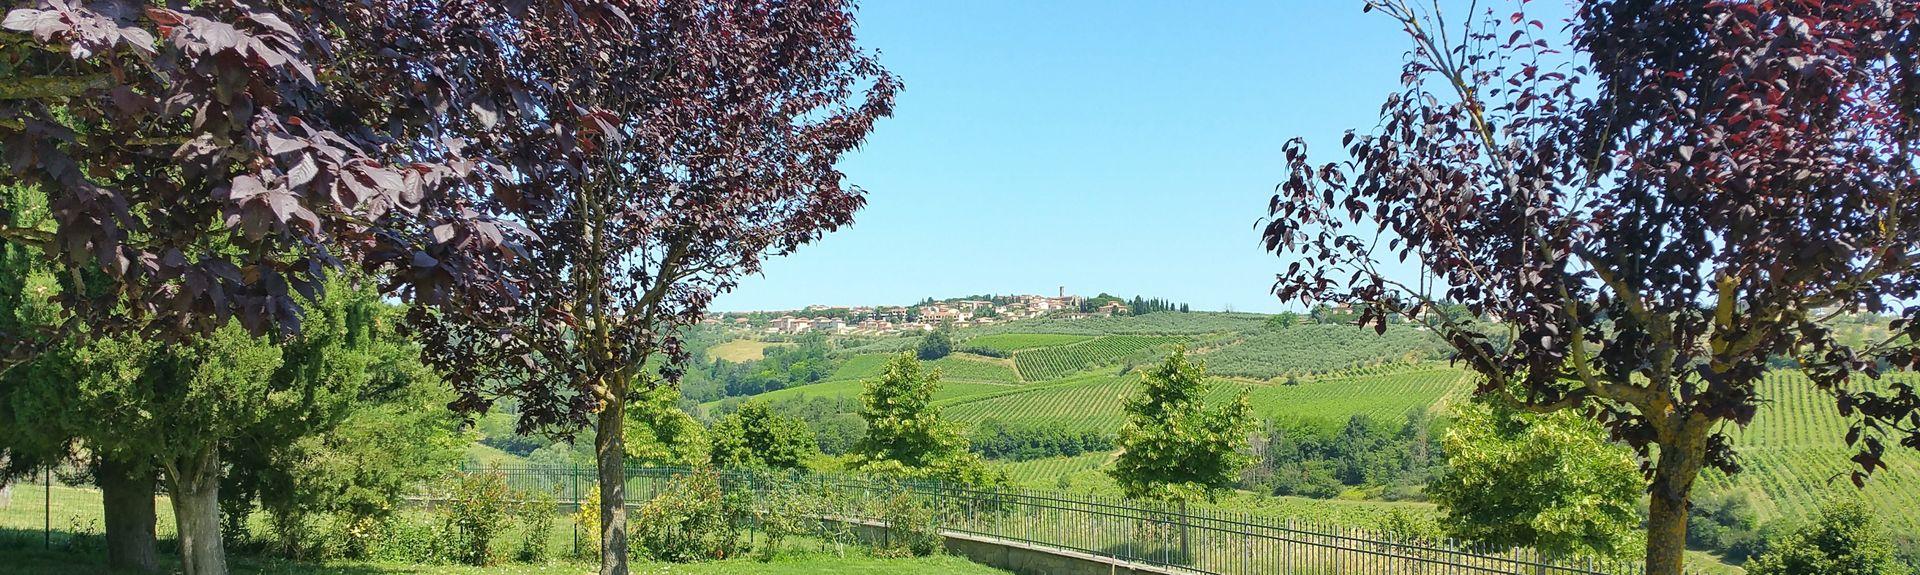 Castellina In Chianti, Τοσκάνη, Ιταλία